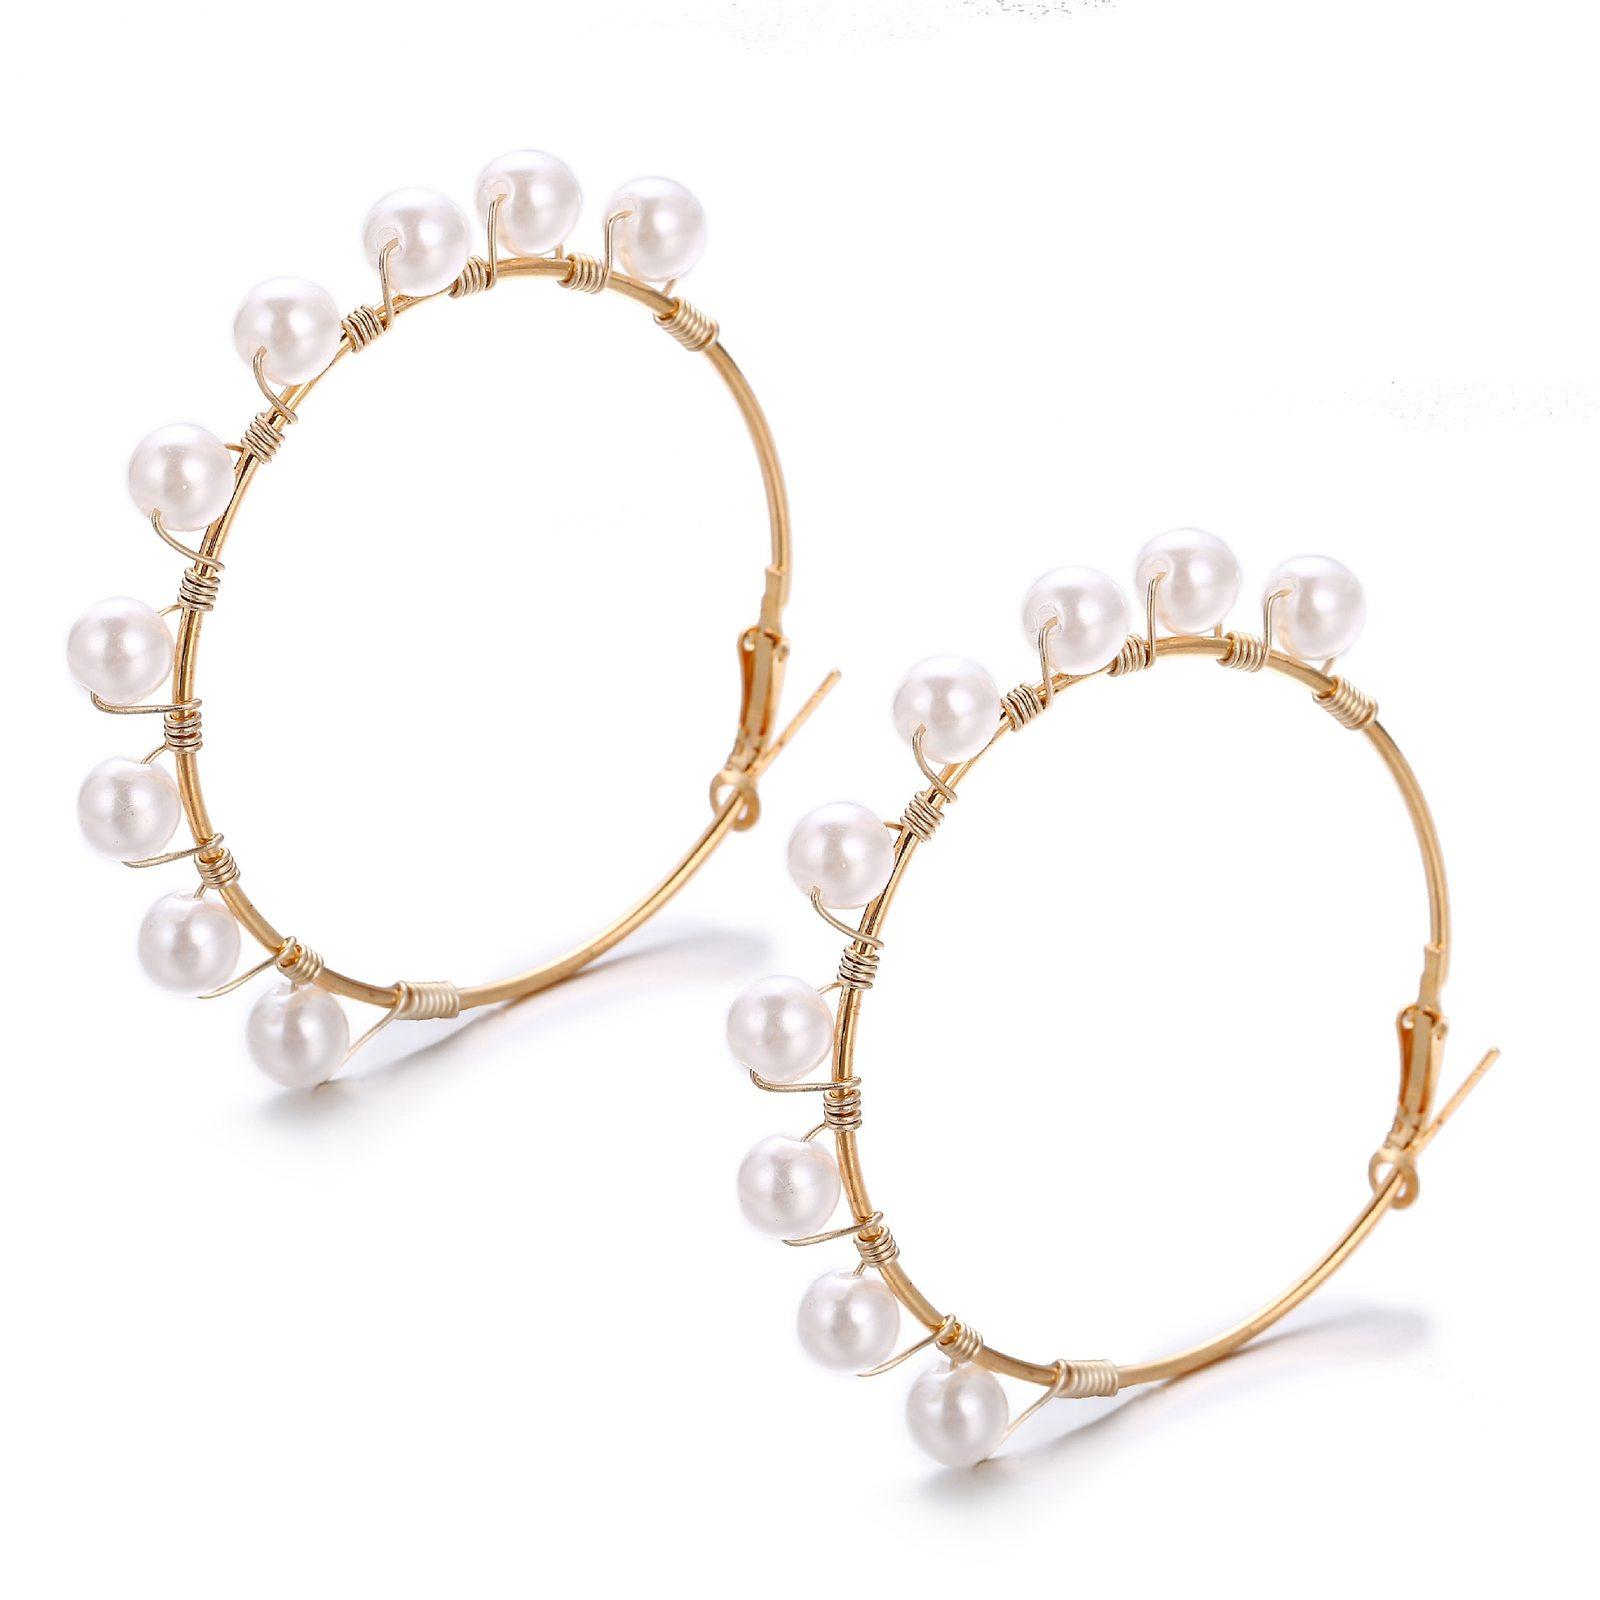 ZILPOIT New Fashion Jewelry Bijoux Gifts Wholesale Big Circle Round Drop Earring - $9.01